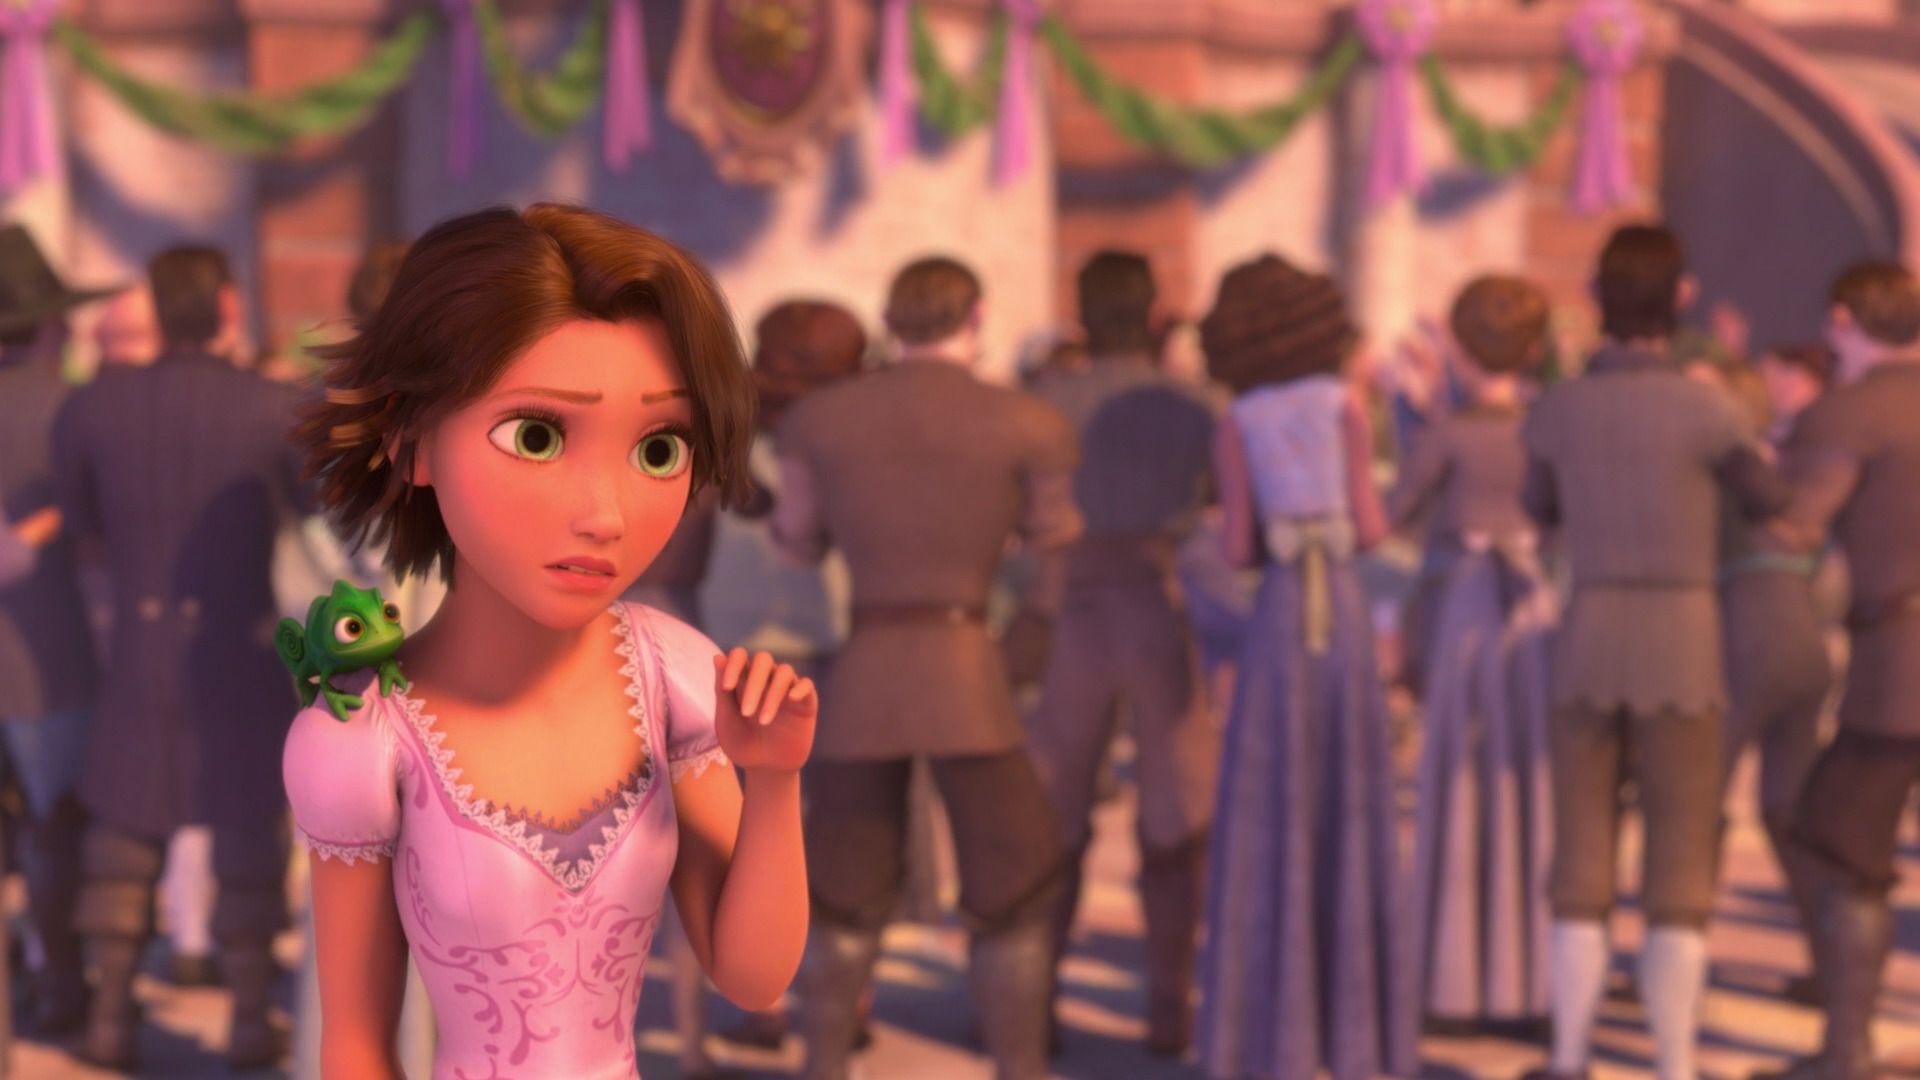 Rapunzel Of Disney S Tangled Photo Princess Rapunzel Ending Princess Rapunzel Disney Tangled Princess